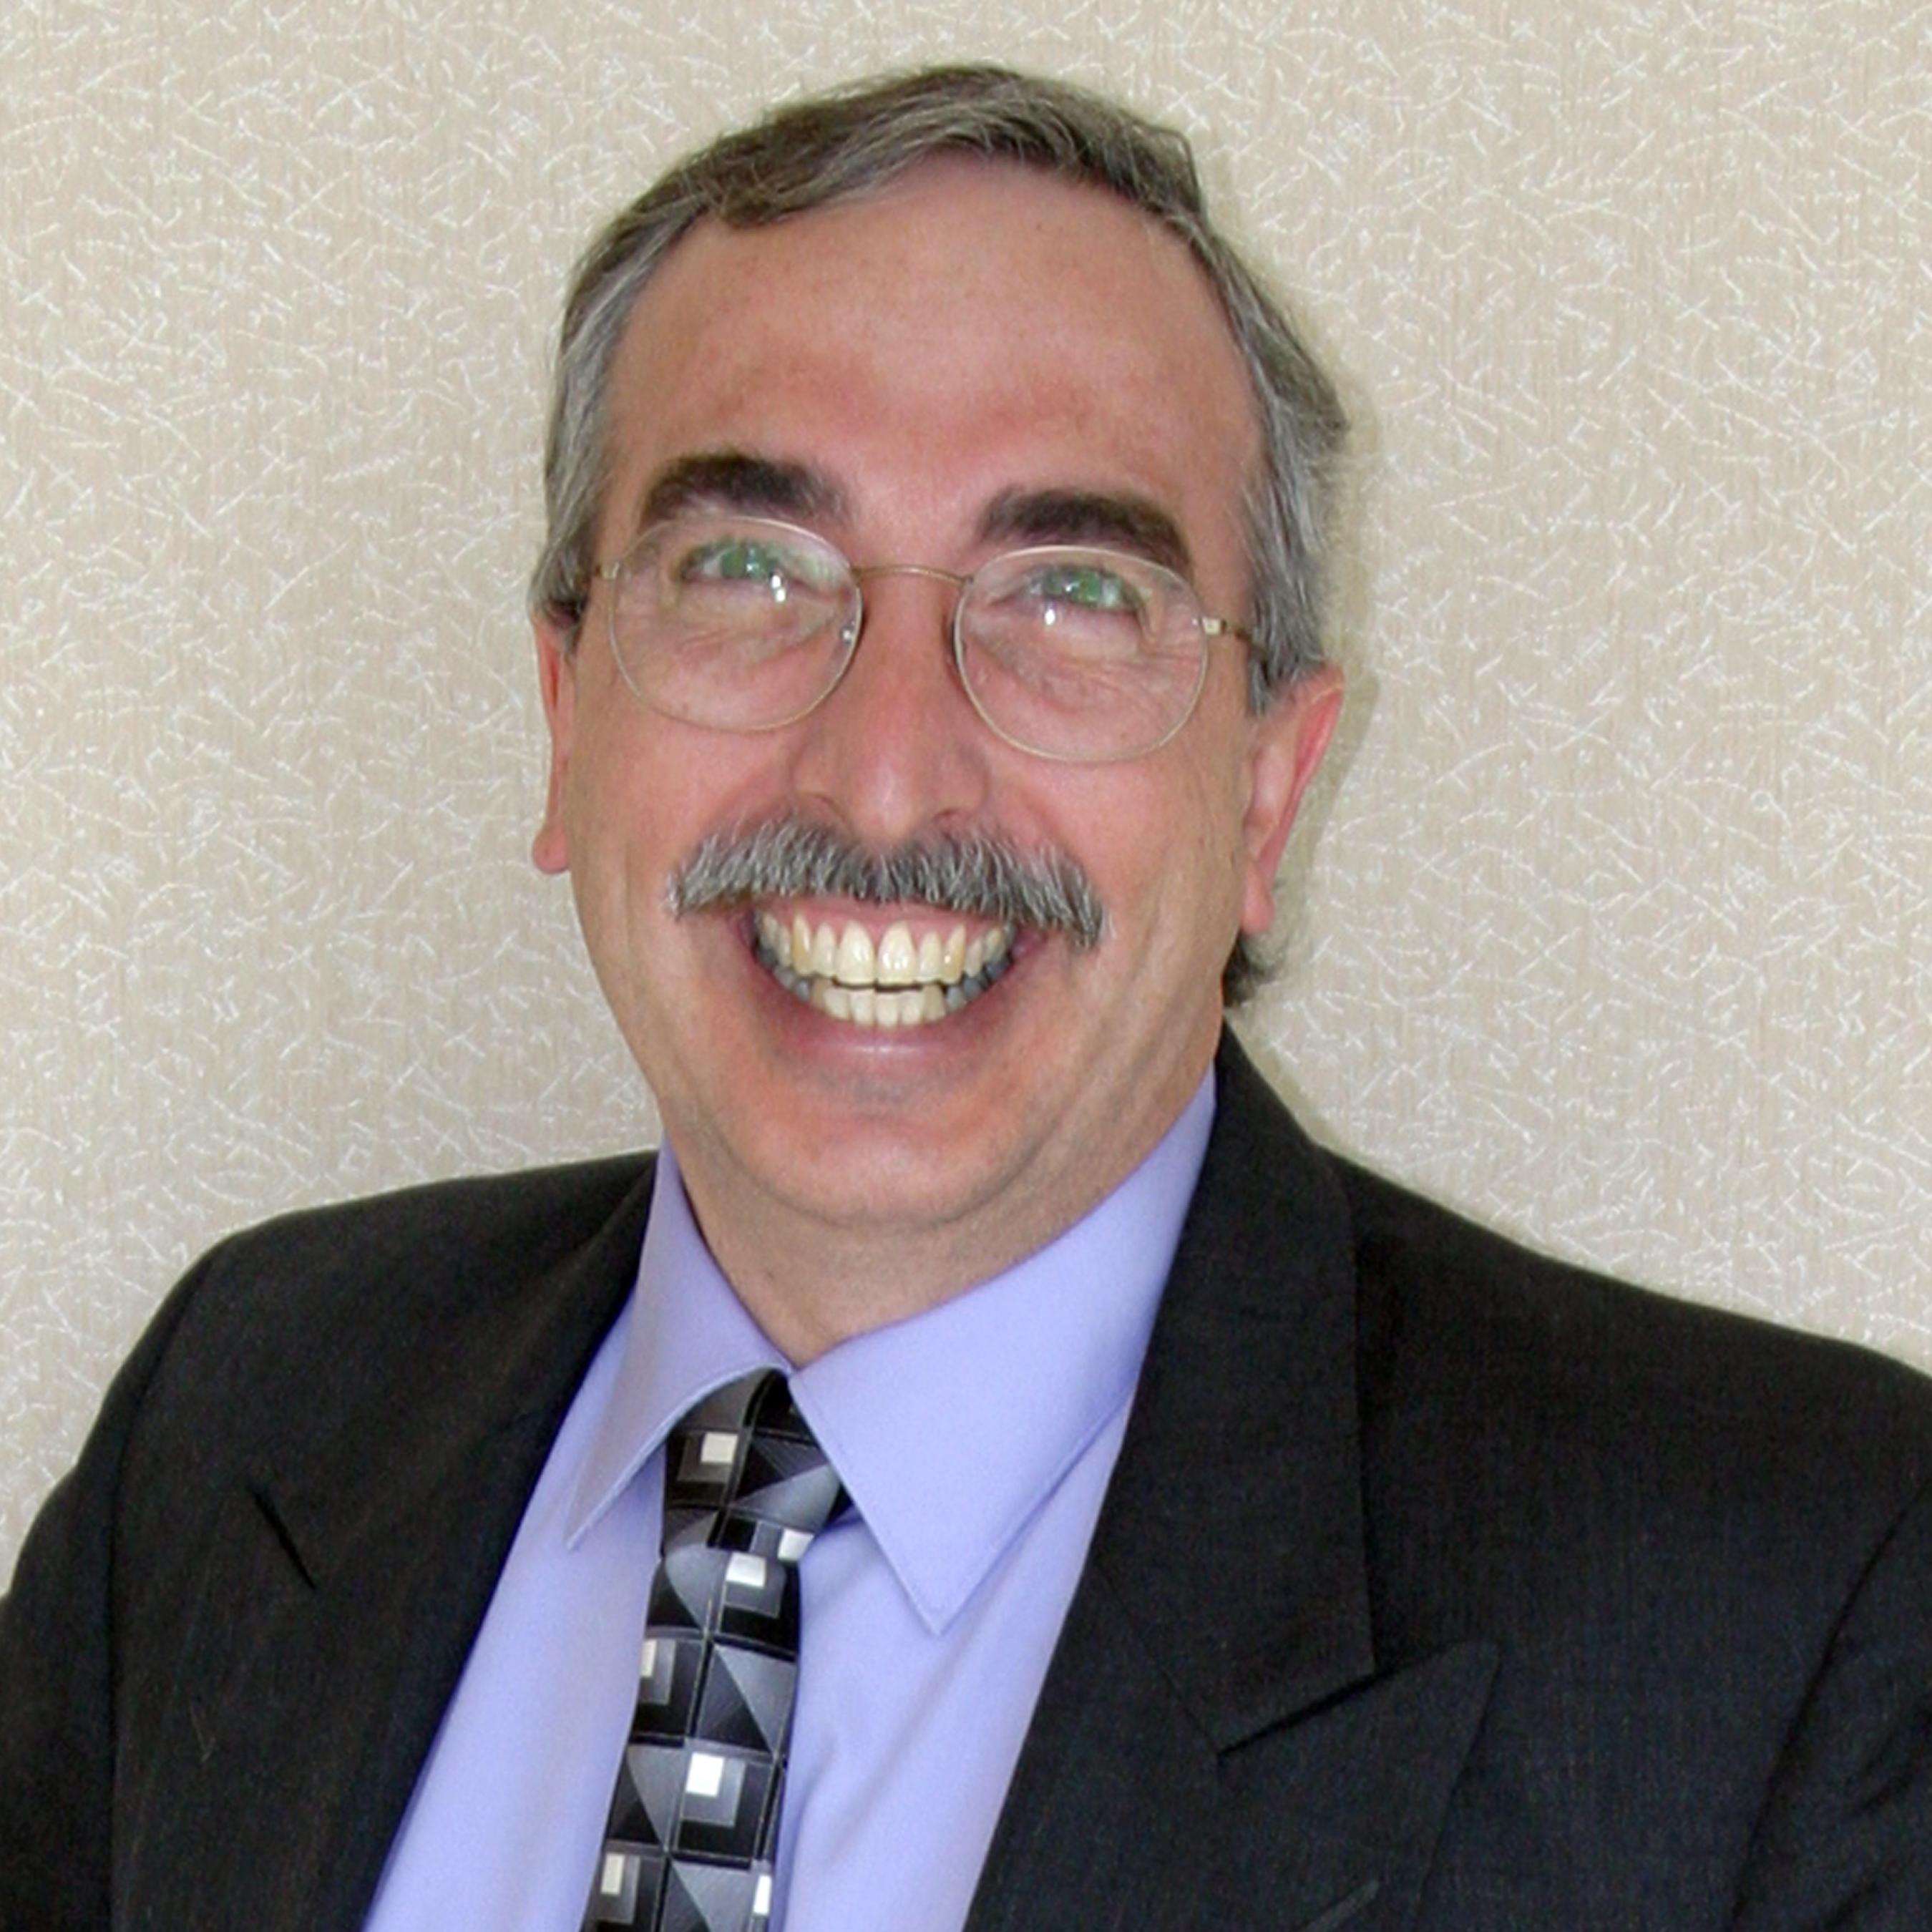 Gerry Hanley